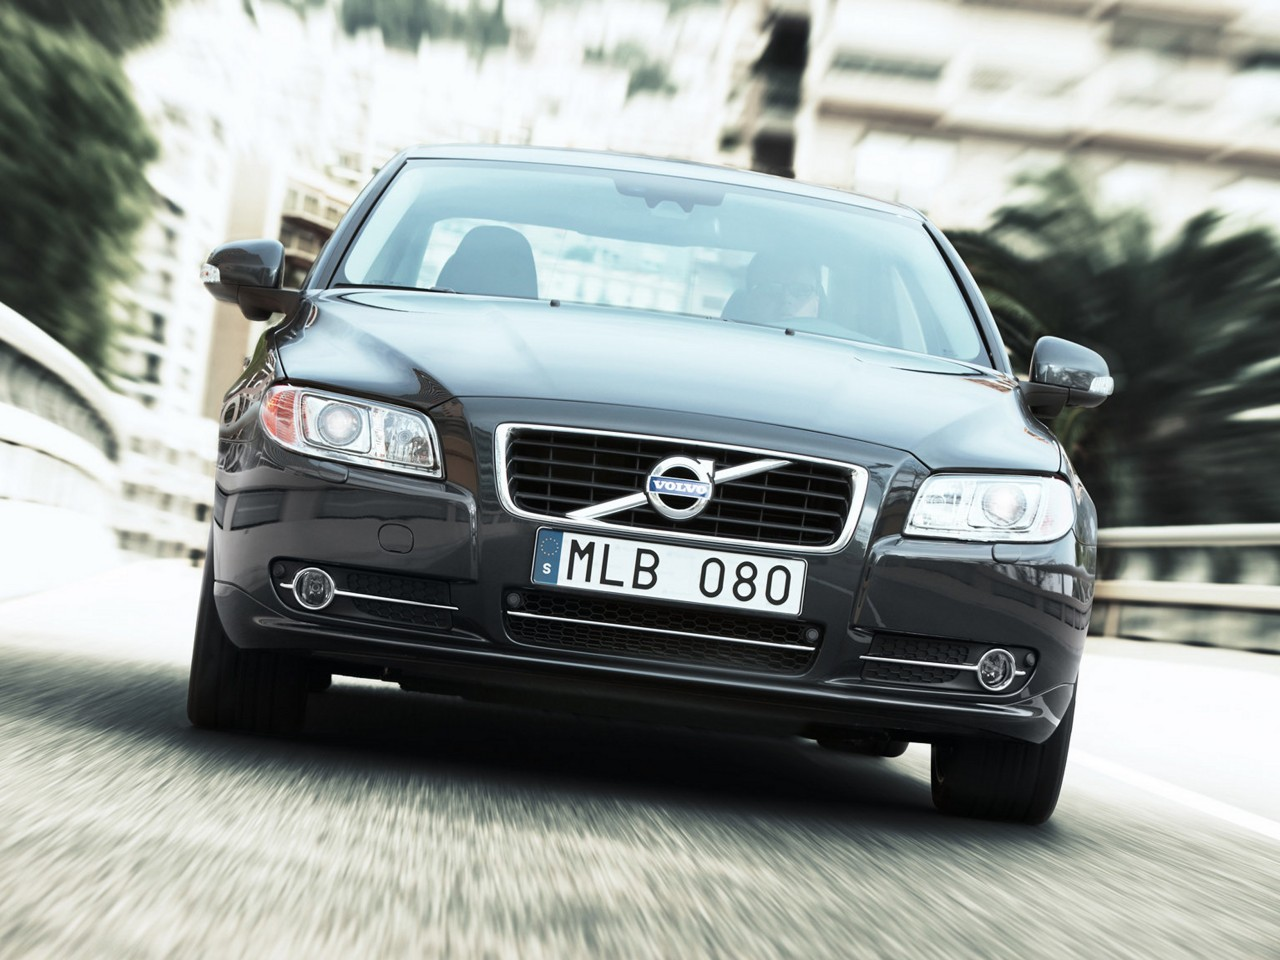 2010 Volvo S80 D5 AWD | Motor Desktop